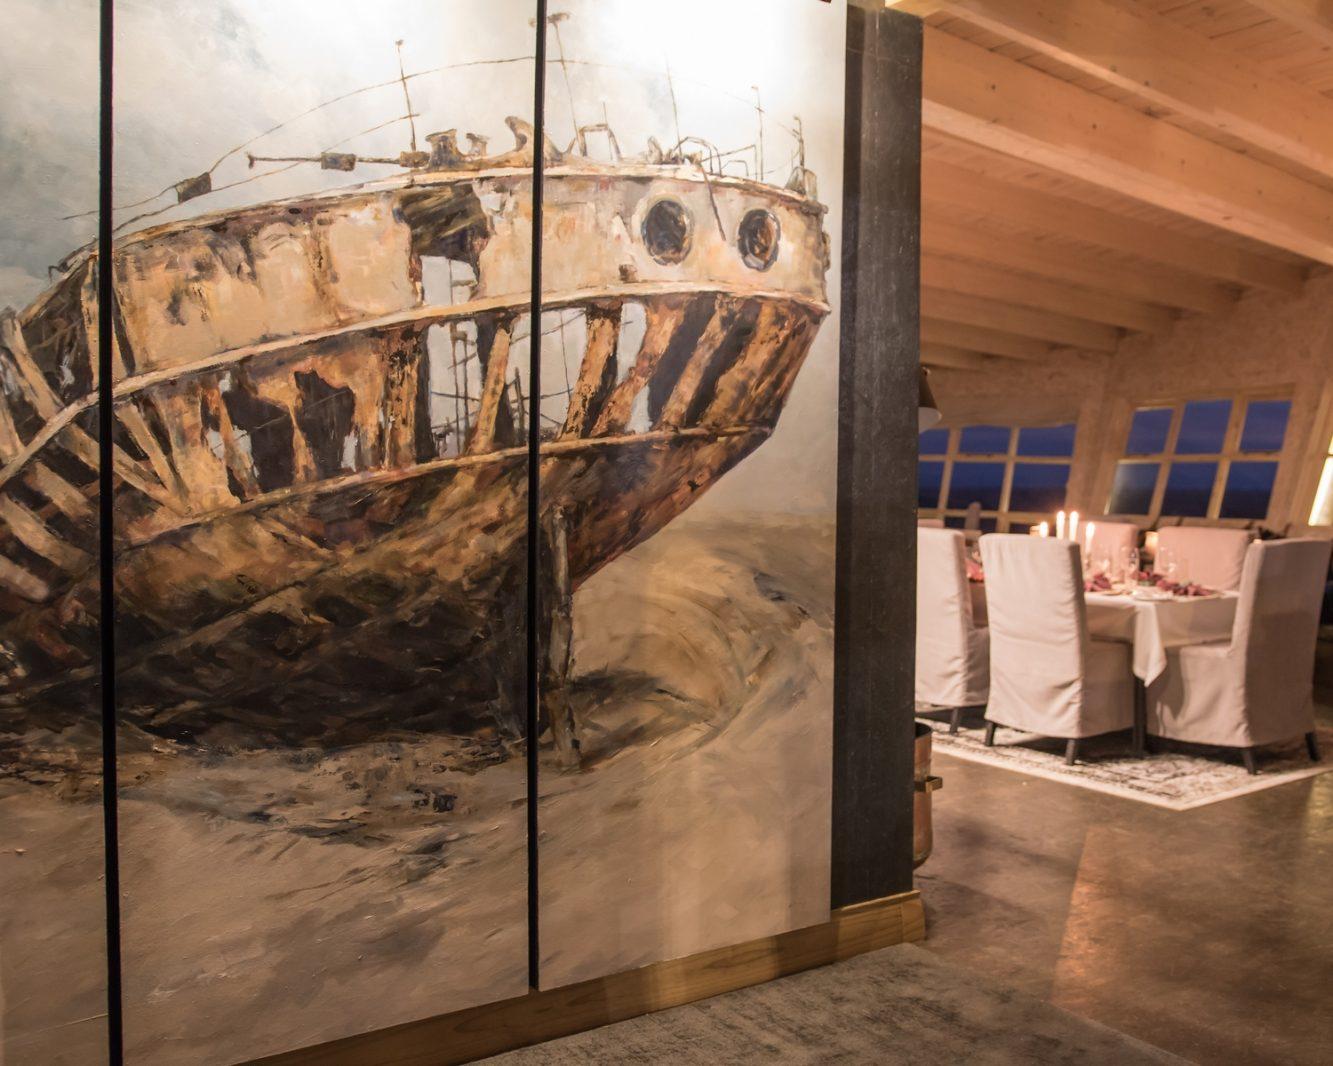 DB Shipwreck Main Interior Sunset HRes-10 (Copiar)